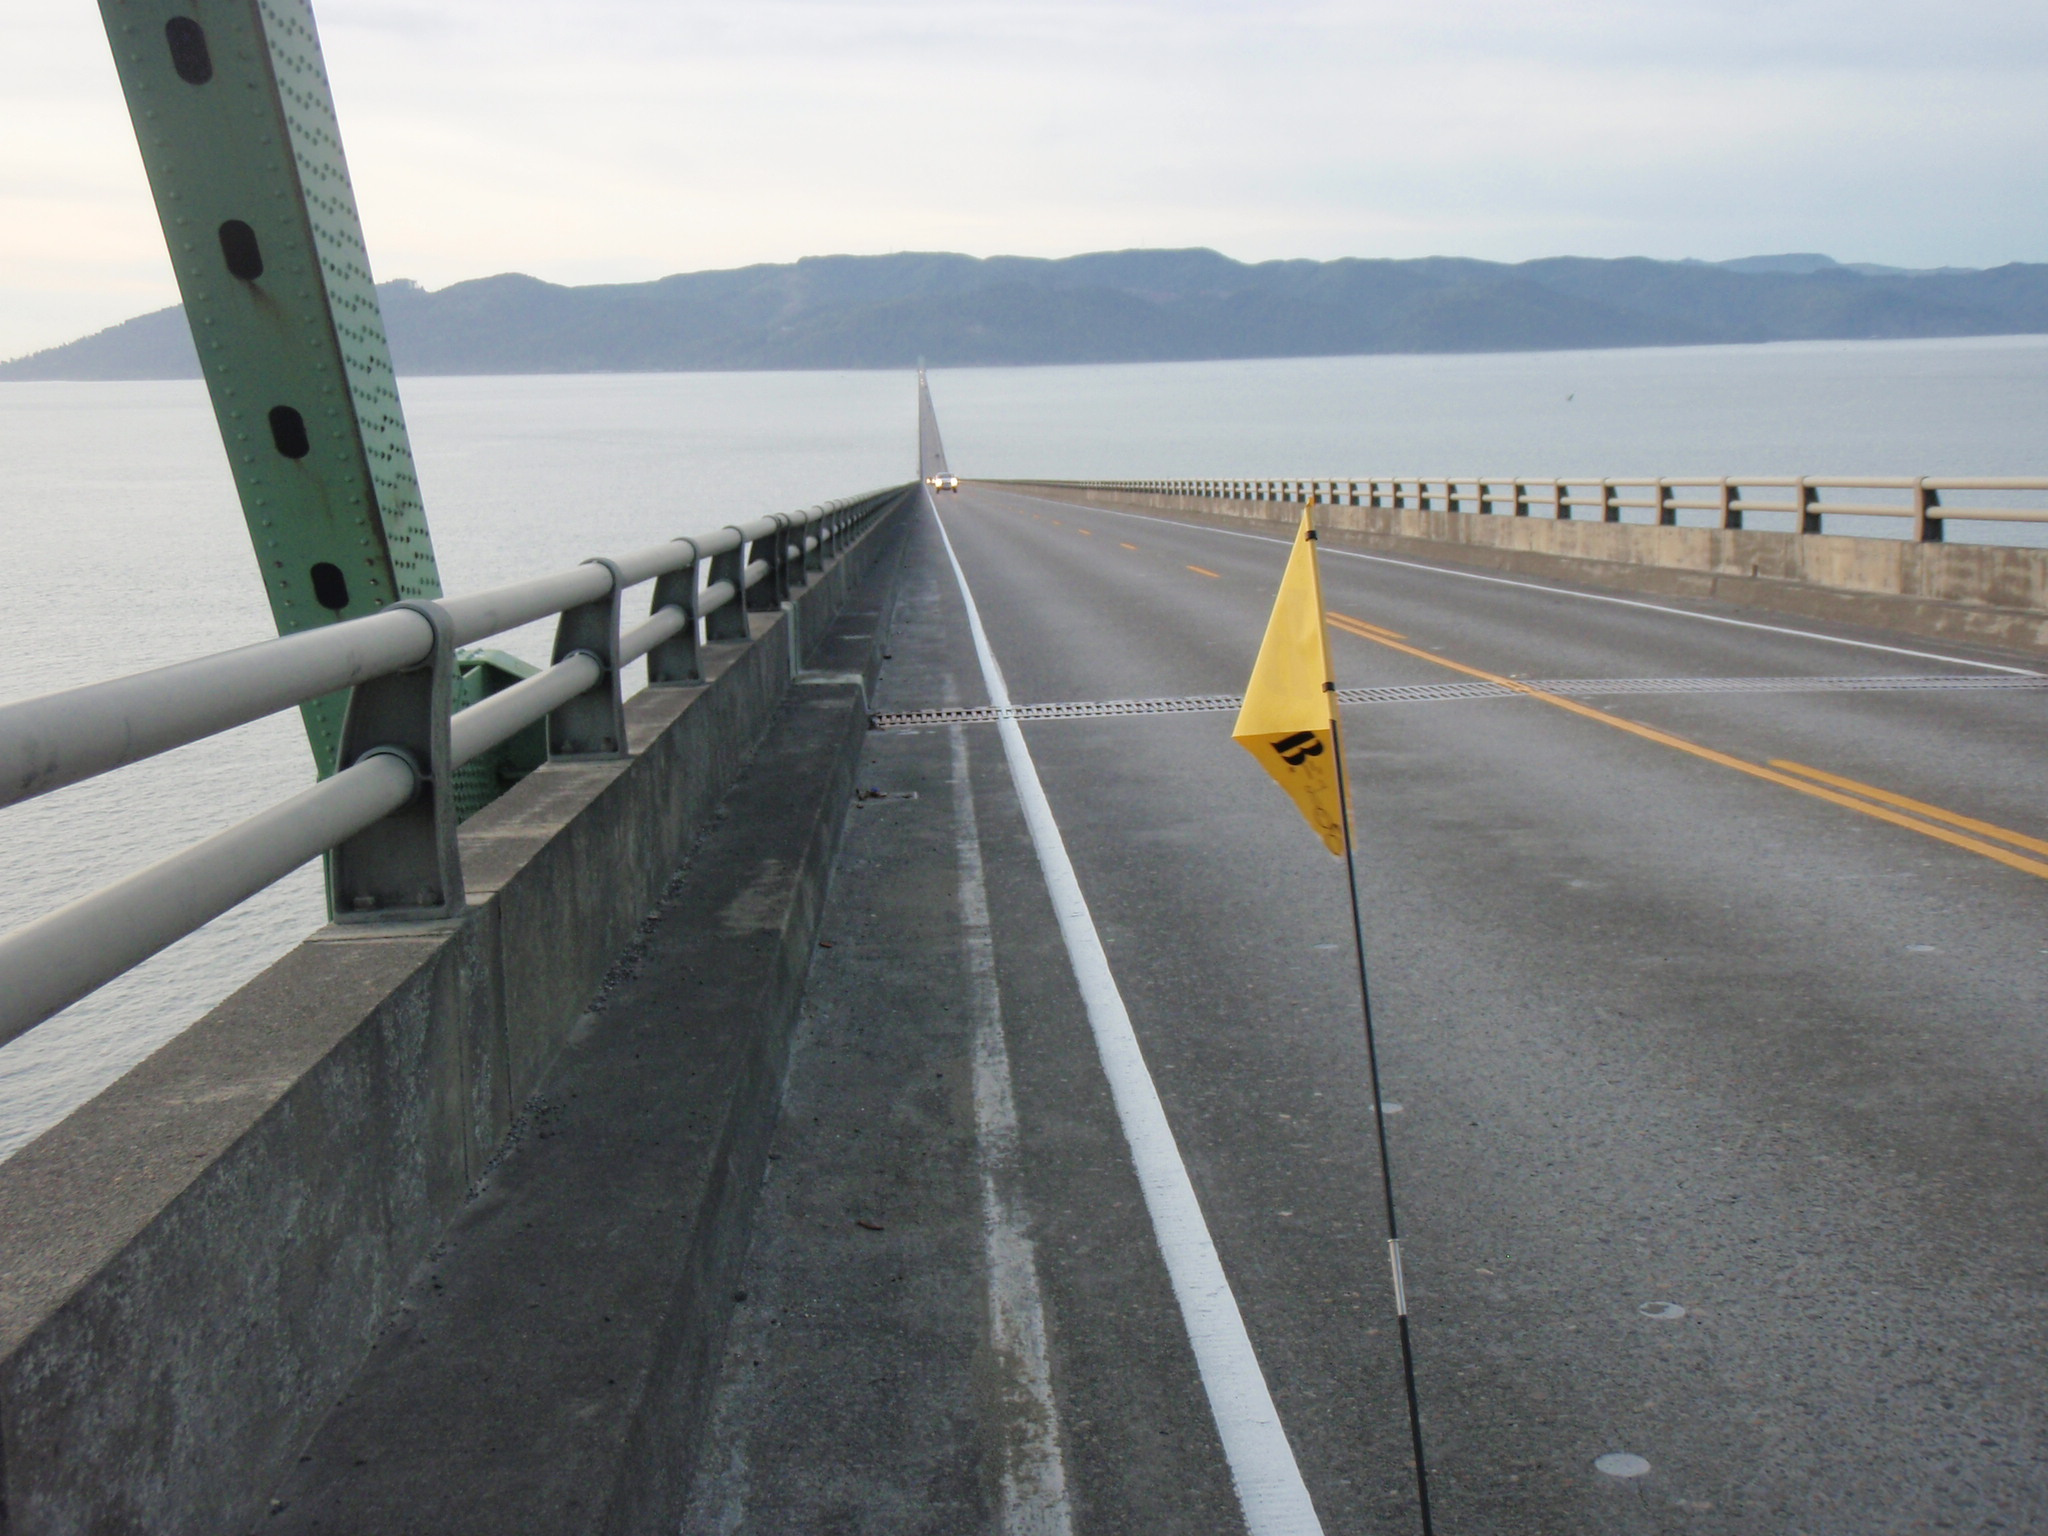 Riding across the 6.5km long Astoria Megler Bridge